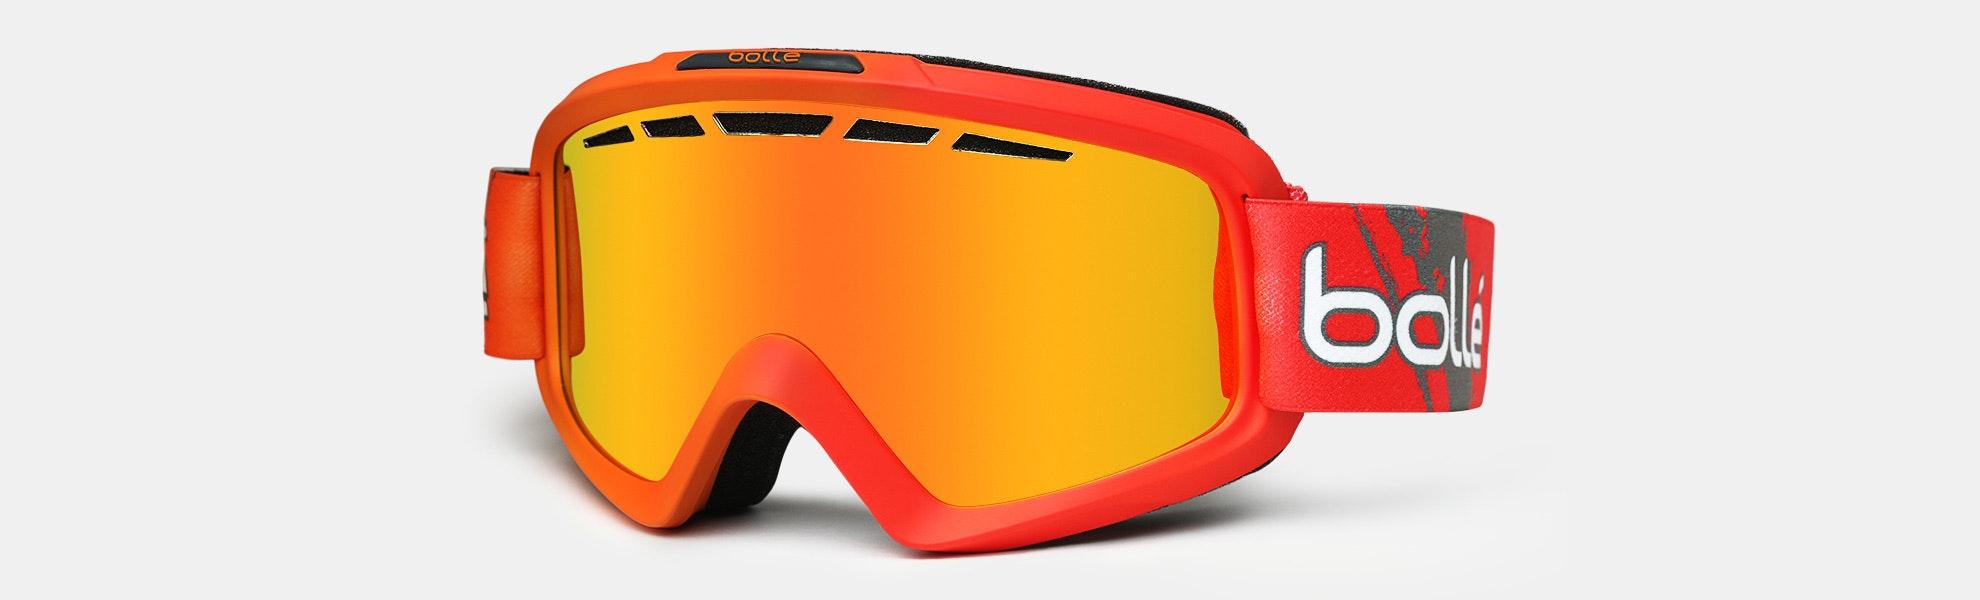 Bolle Nova II Men's Double Lens Snow Goggles